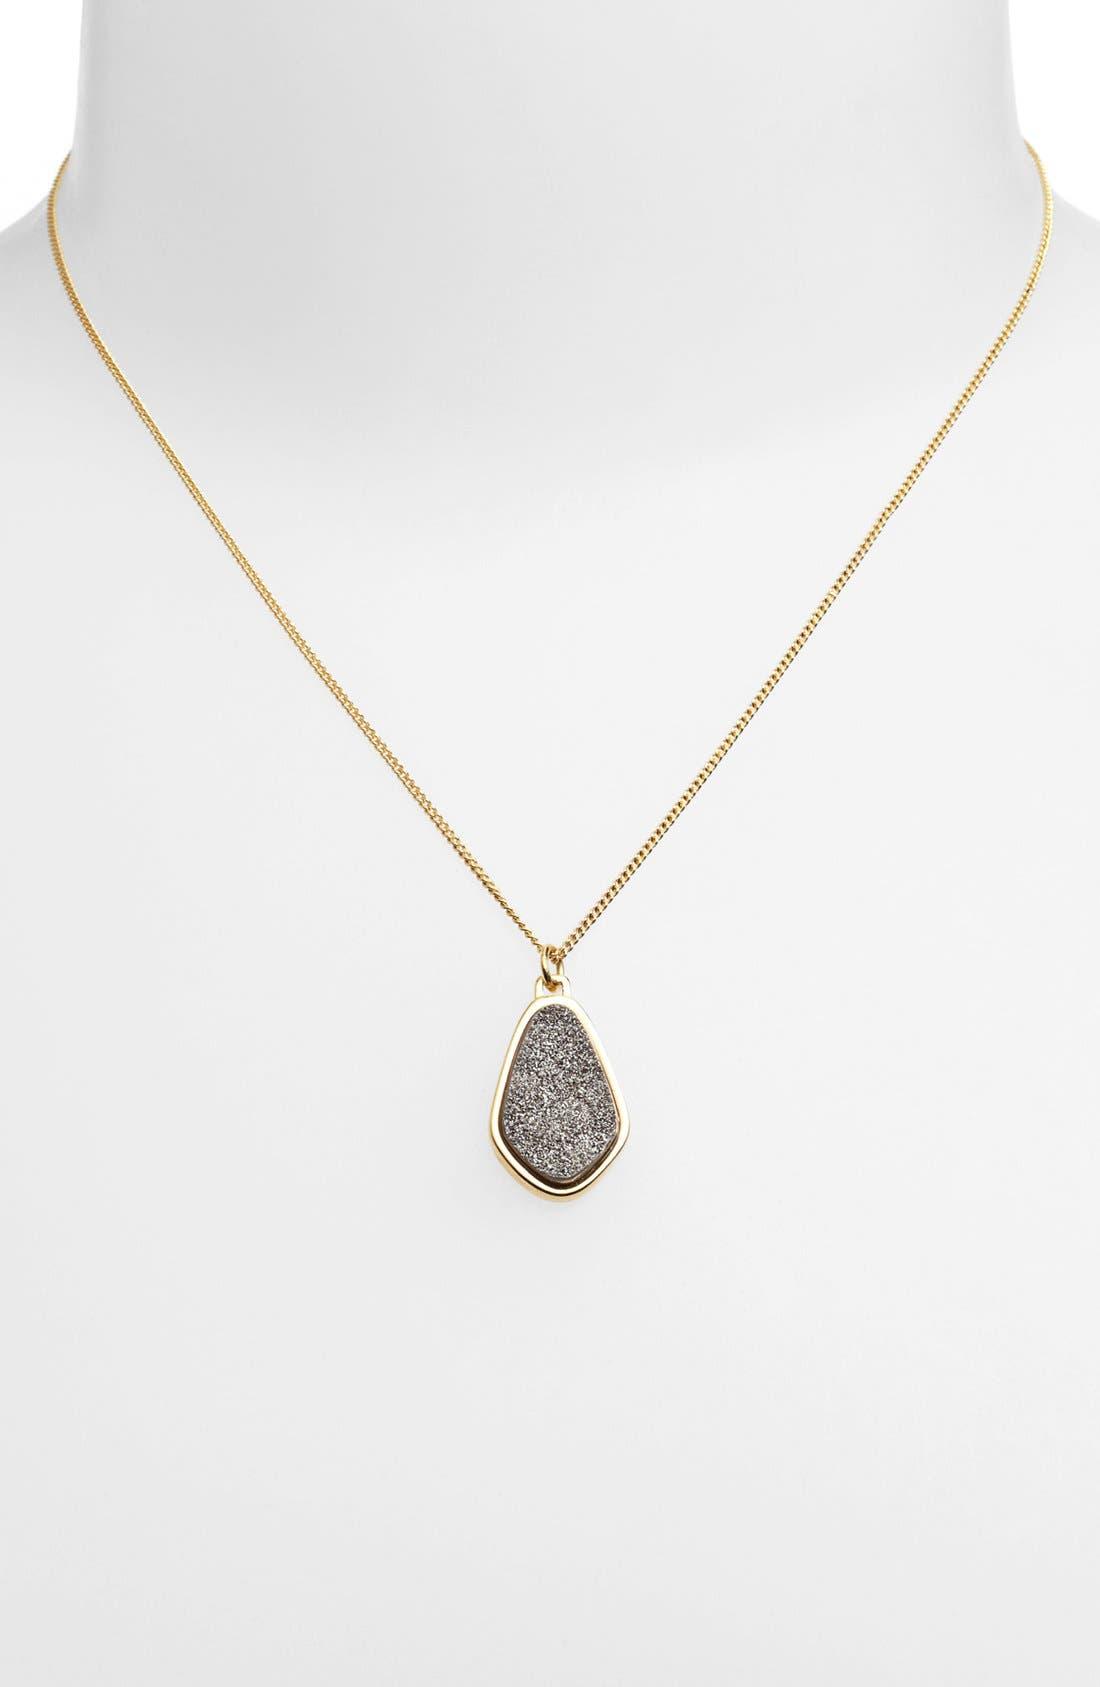 Main Image - Marcia Moran Organic Shape Pendant Necklace (Online Only)